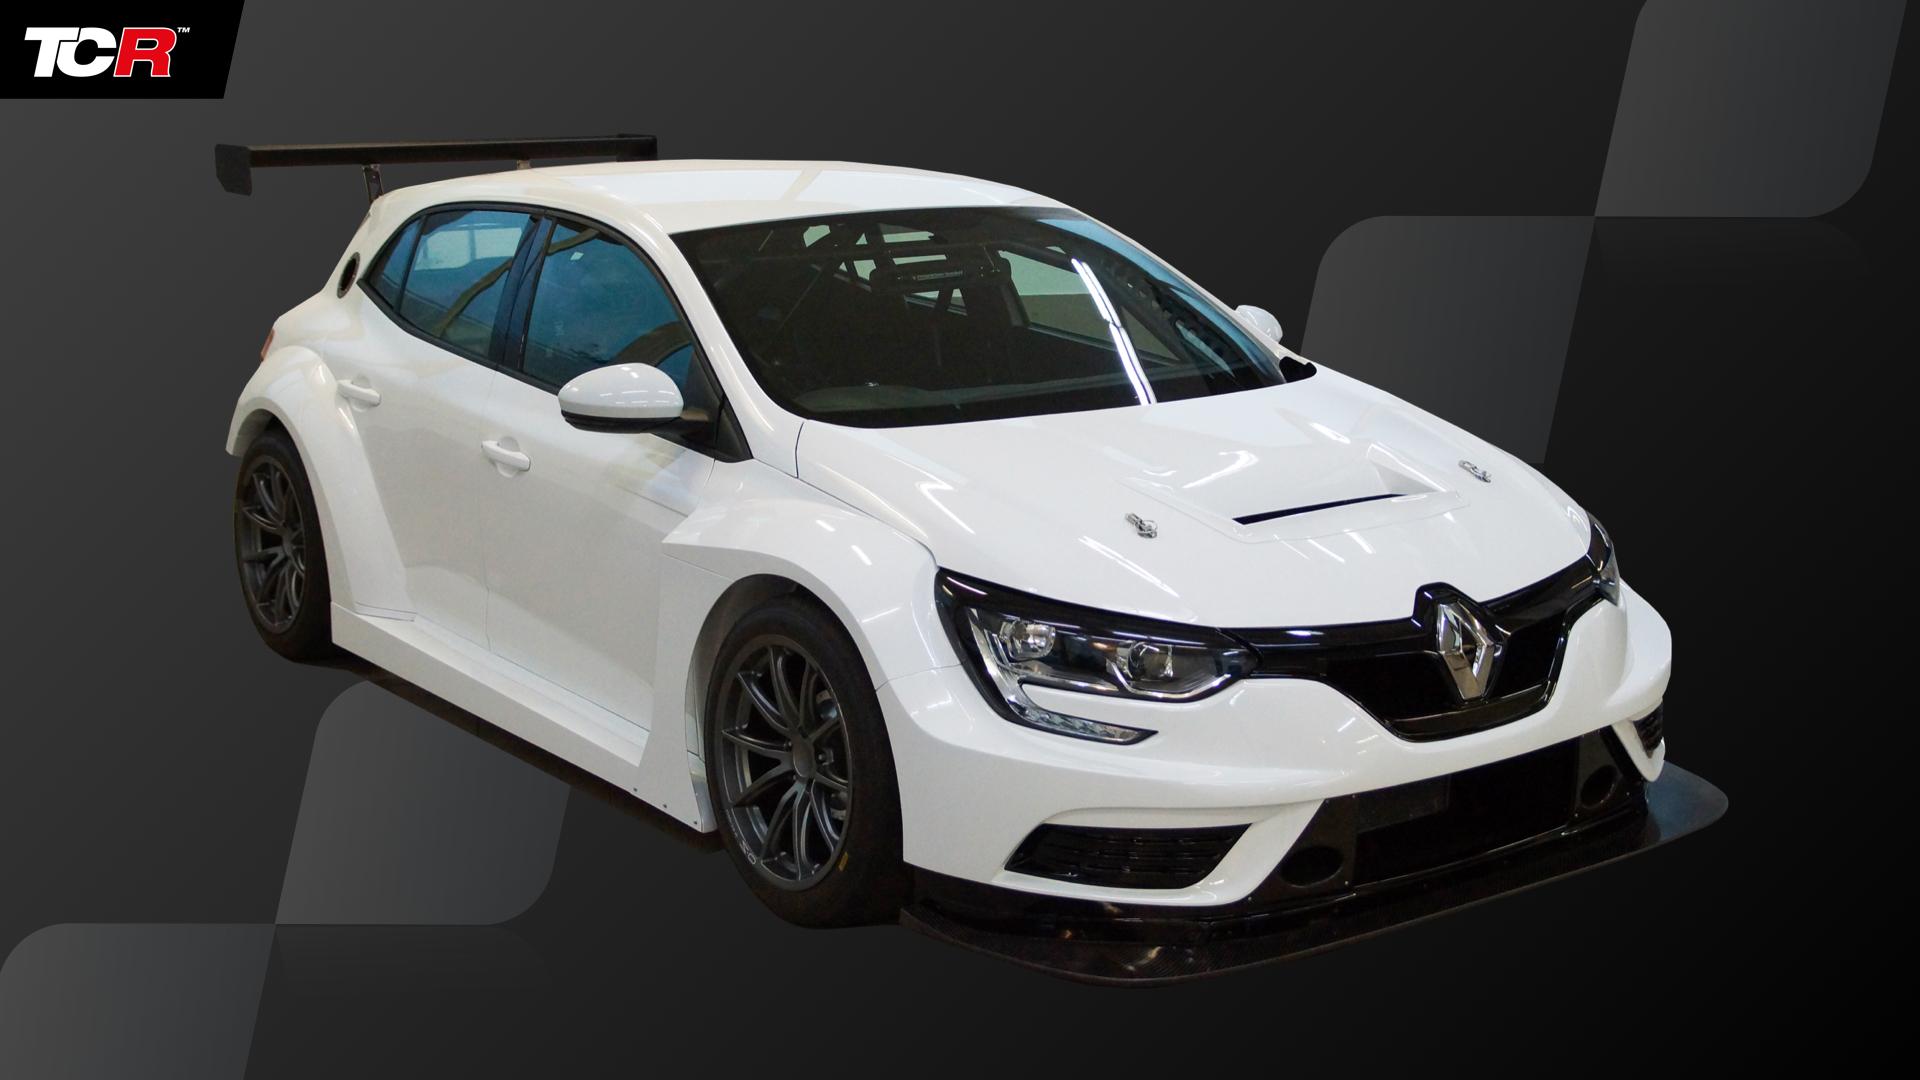 Renault Mégane TCR